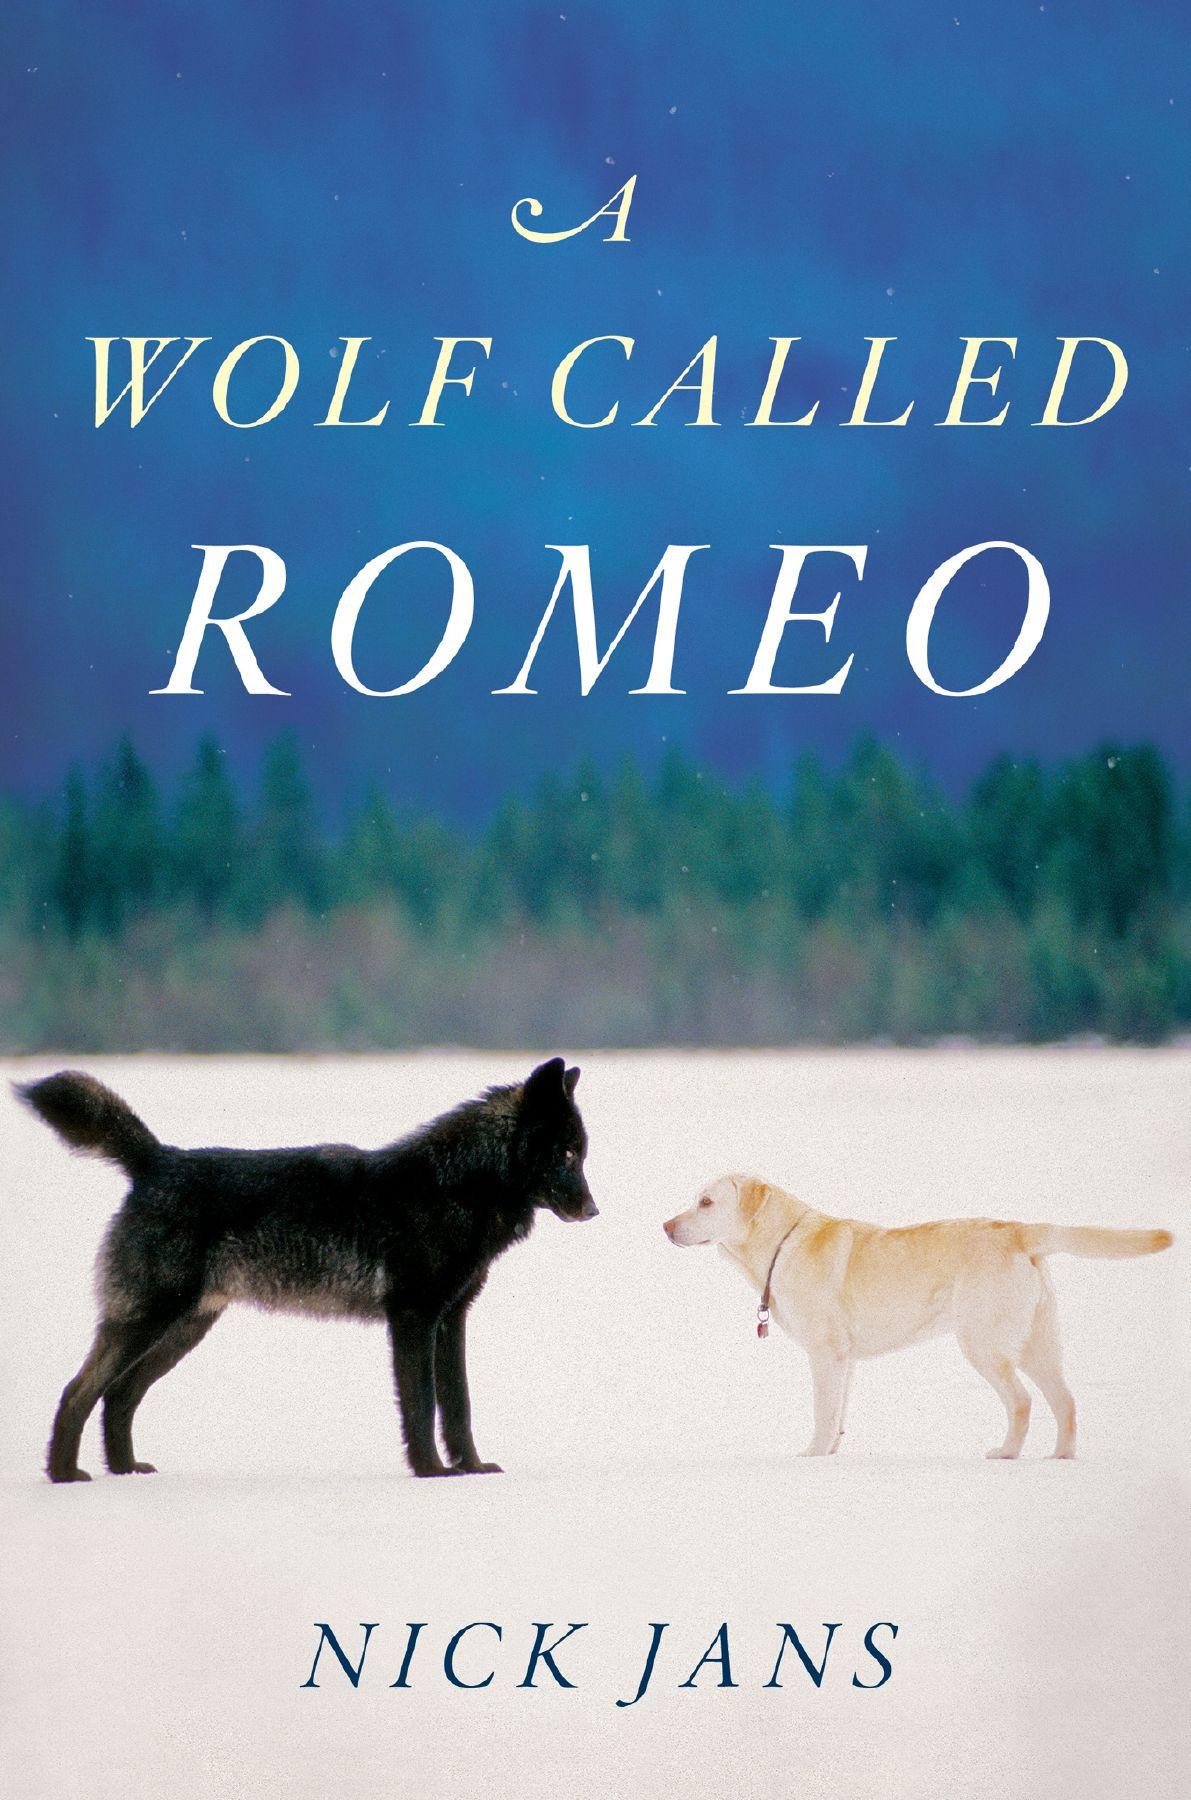 How A Wolf Named Romeo Won Hearts In An Alaska Suburb Wolf Call